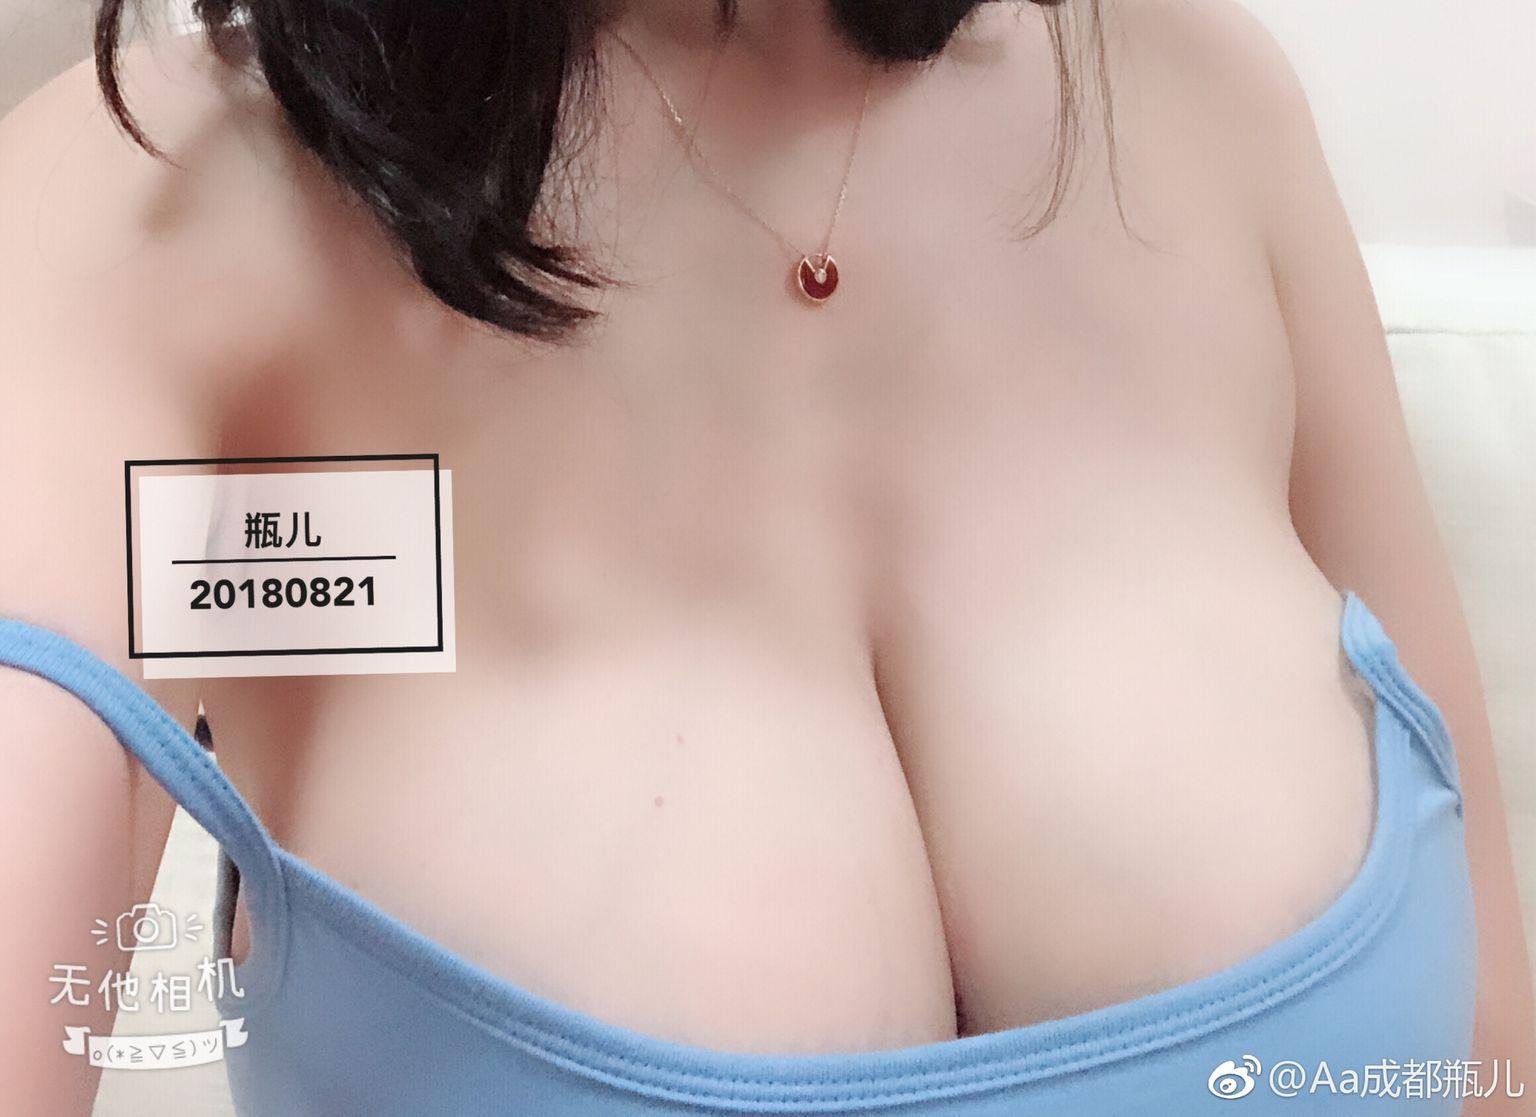 aHR0cHM6Ly93d3cubXlteXBpYy5uZXQvZGF0YS9hdHRhY2htZW50L2ZvcnVtLzIwMTkwOC8yMC8wODM0MDl0cHE5d3FhOW13d2twOHdxLmpwZy50aHVtYi5qcGc%253D - 成都瓶儿 - Chengdu Pinger big tits selfie nude 2020